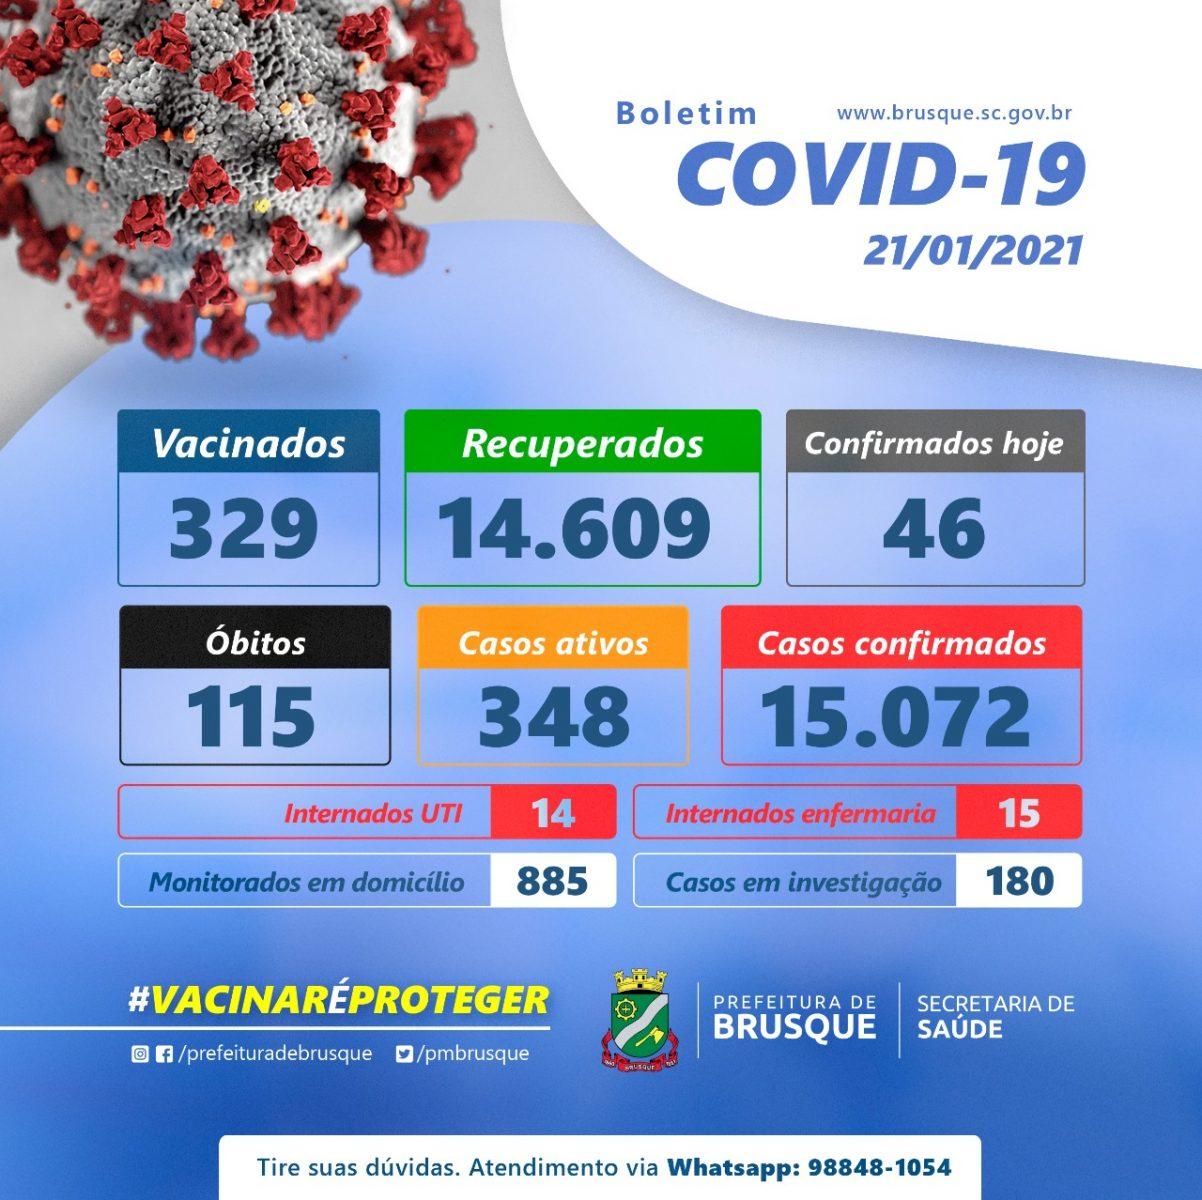 Covid-19: Confira o boletim epidemiológico desta quinta-feira (21)